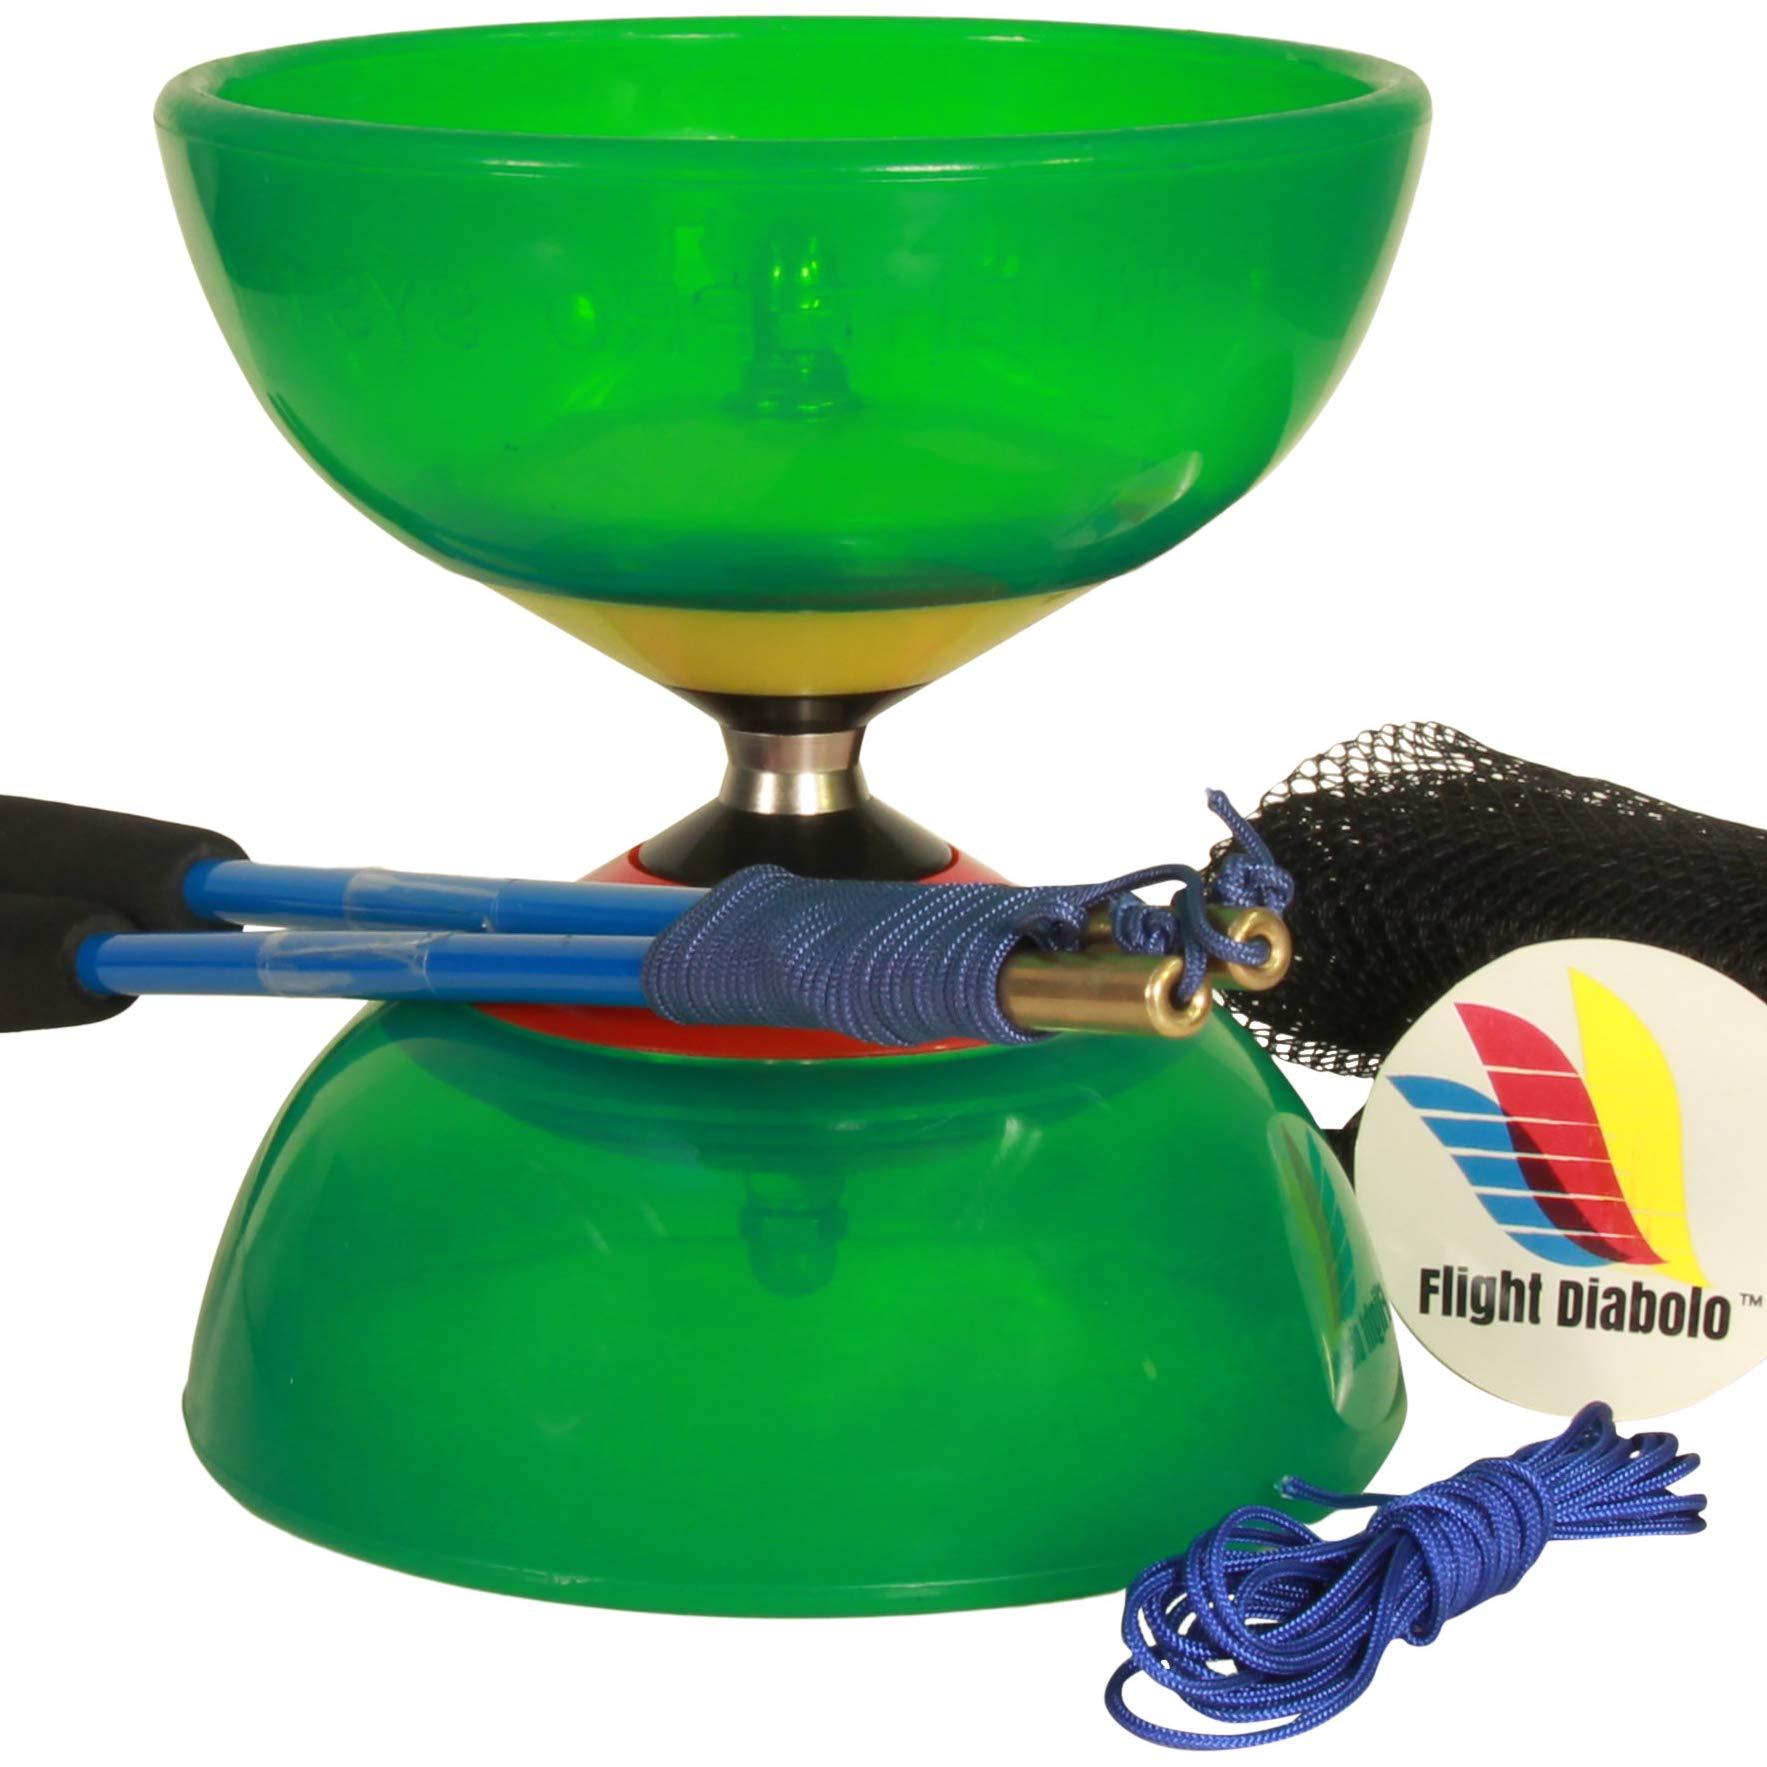 Flight Pro System 5: Triple Bearing Full Sized 5 Chinese Yoyo Diabolo Skill Toy